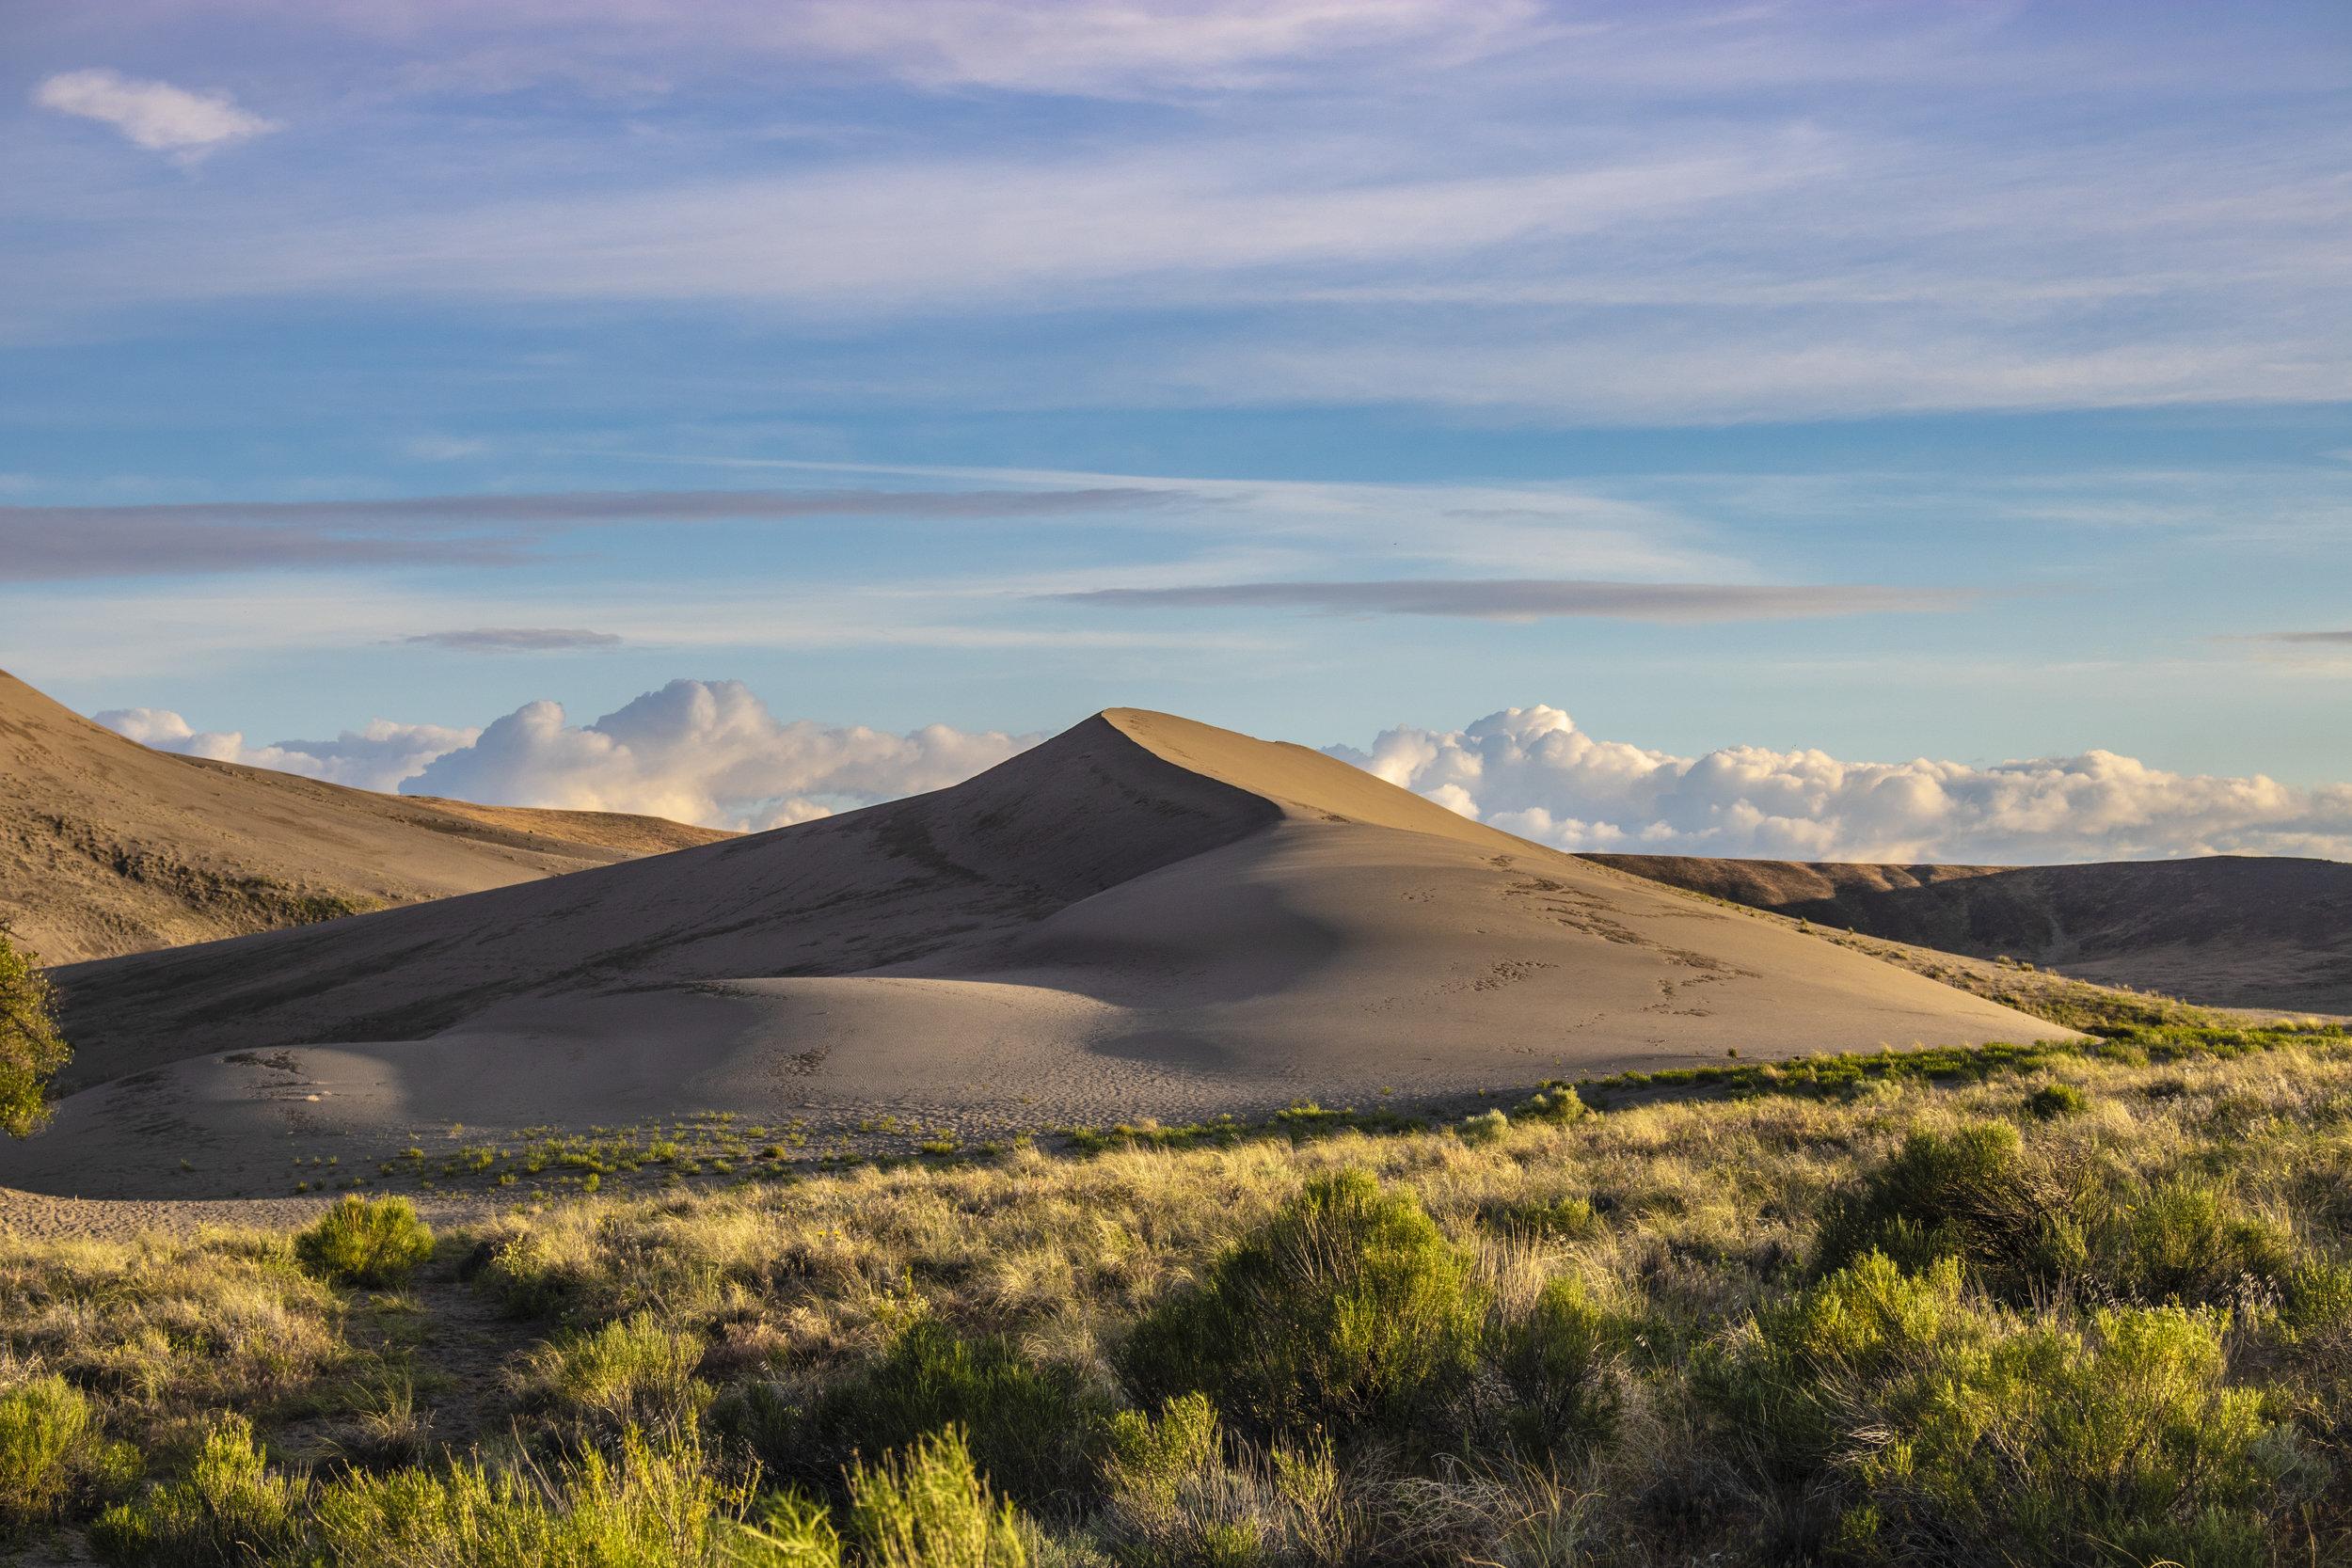 Idaho - Sand Dunes